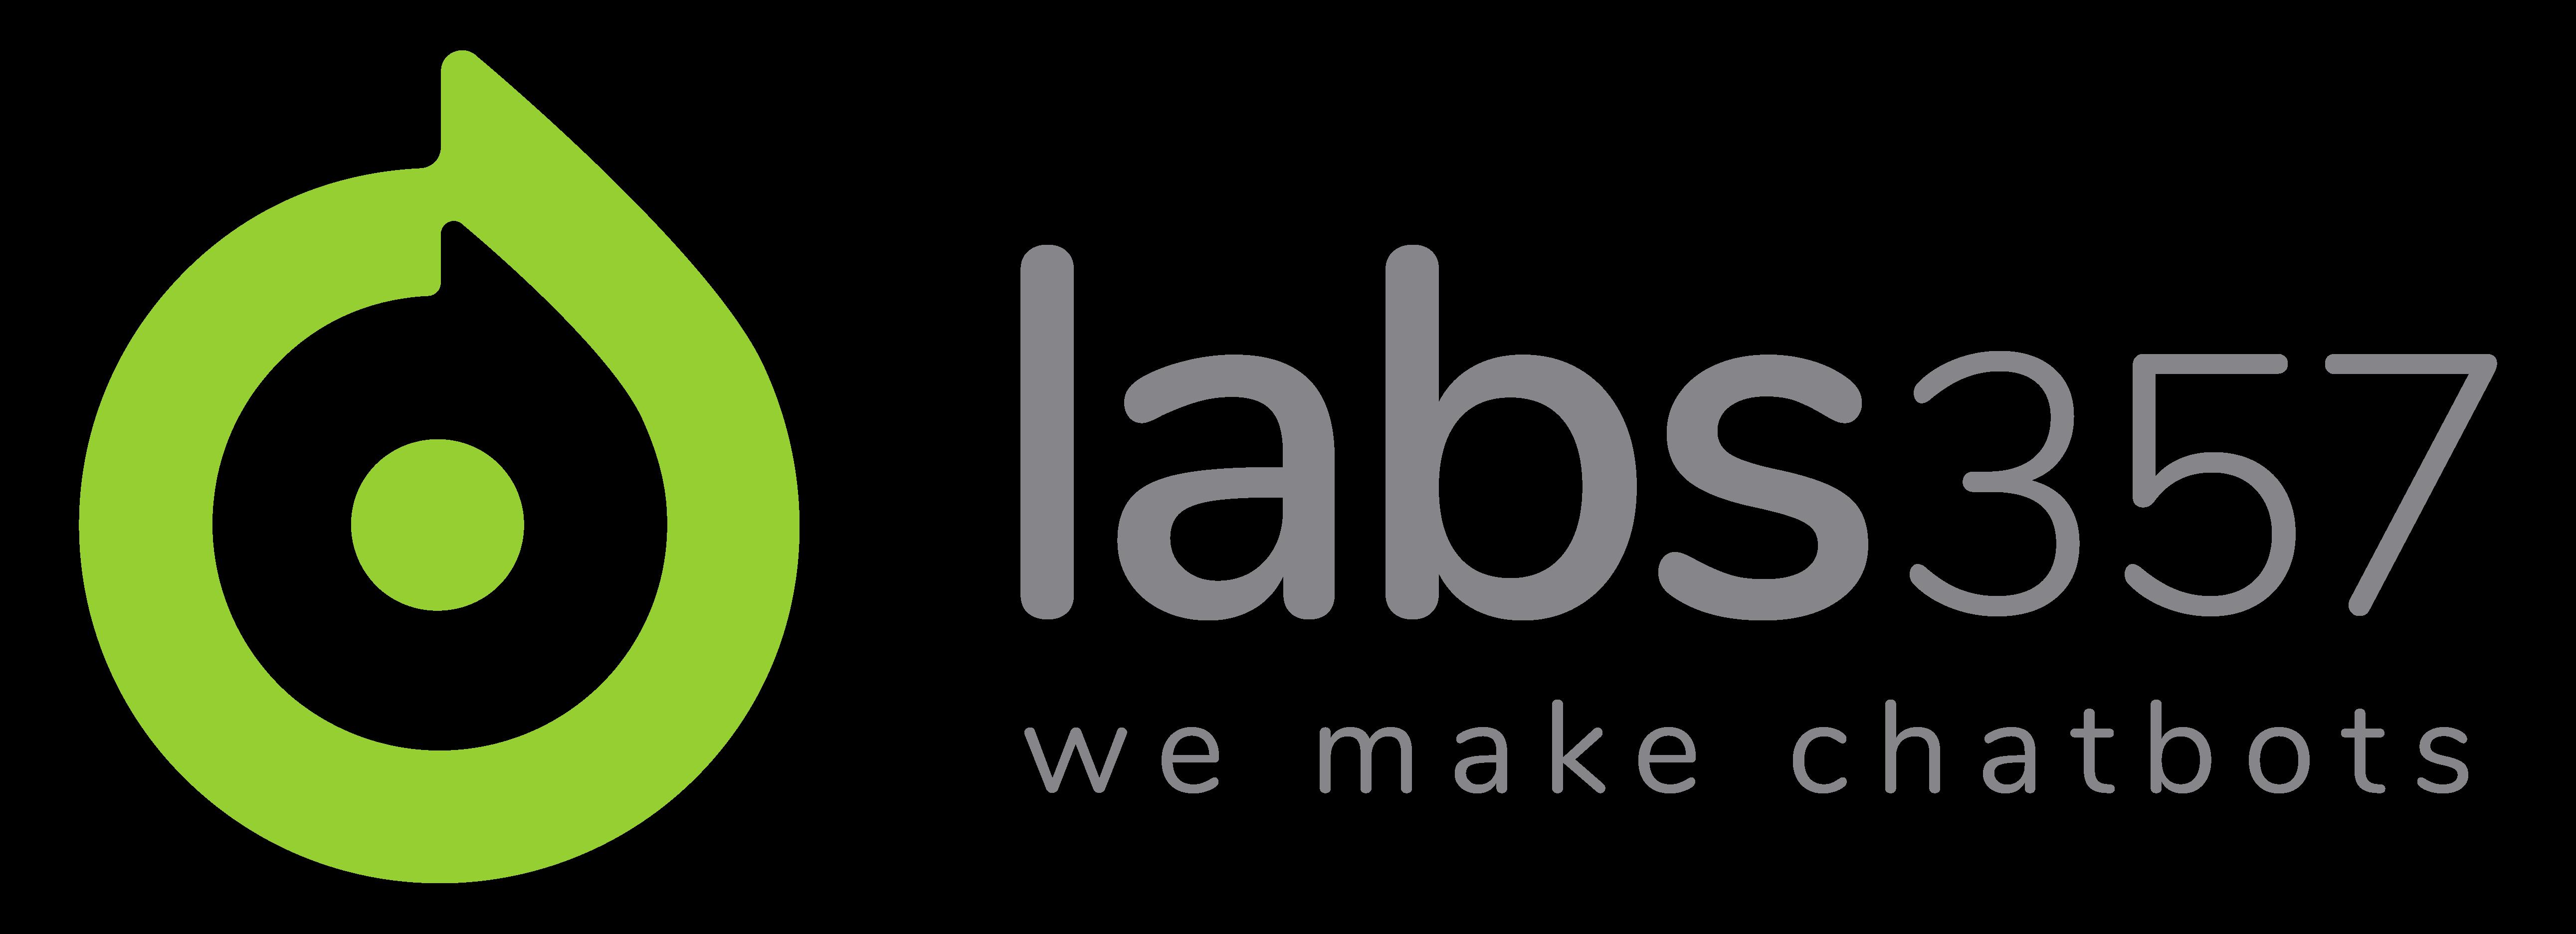 labs357, a chatbot developer